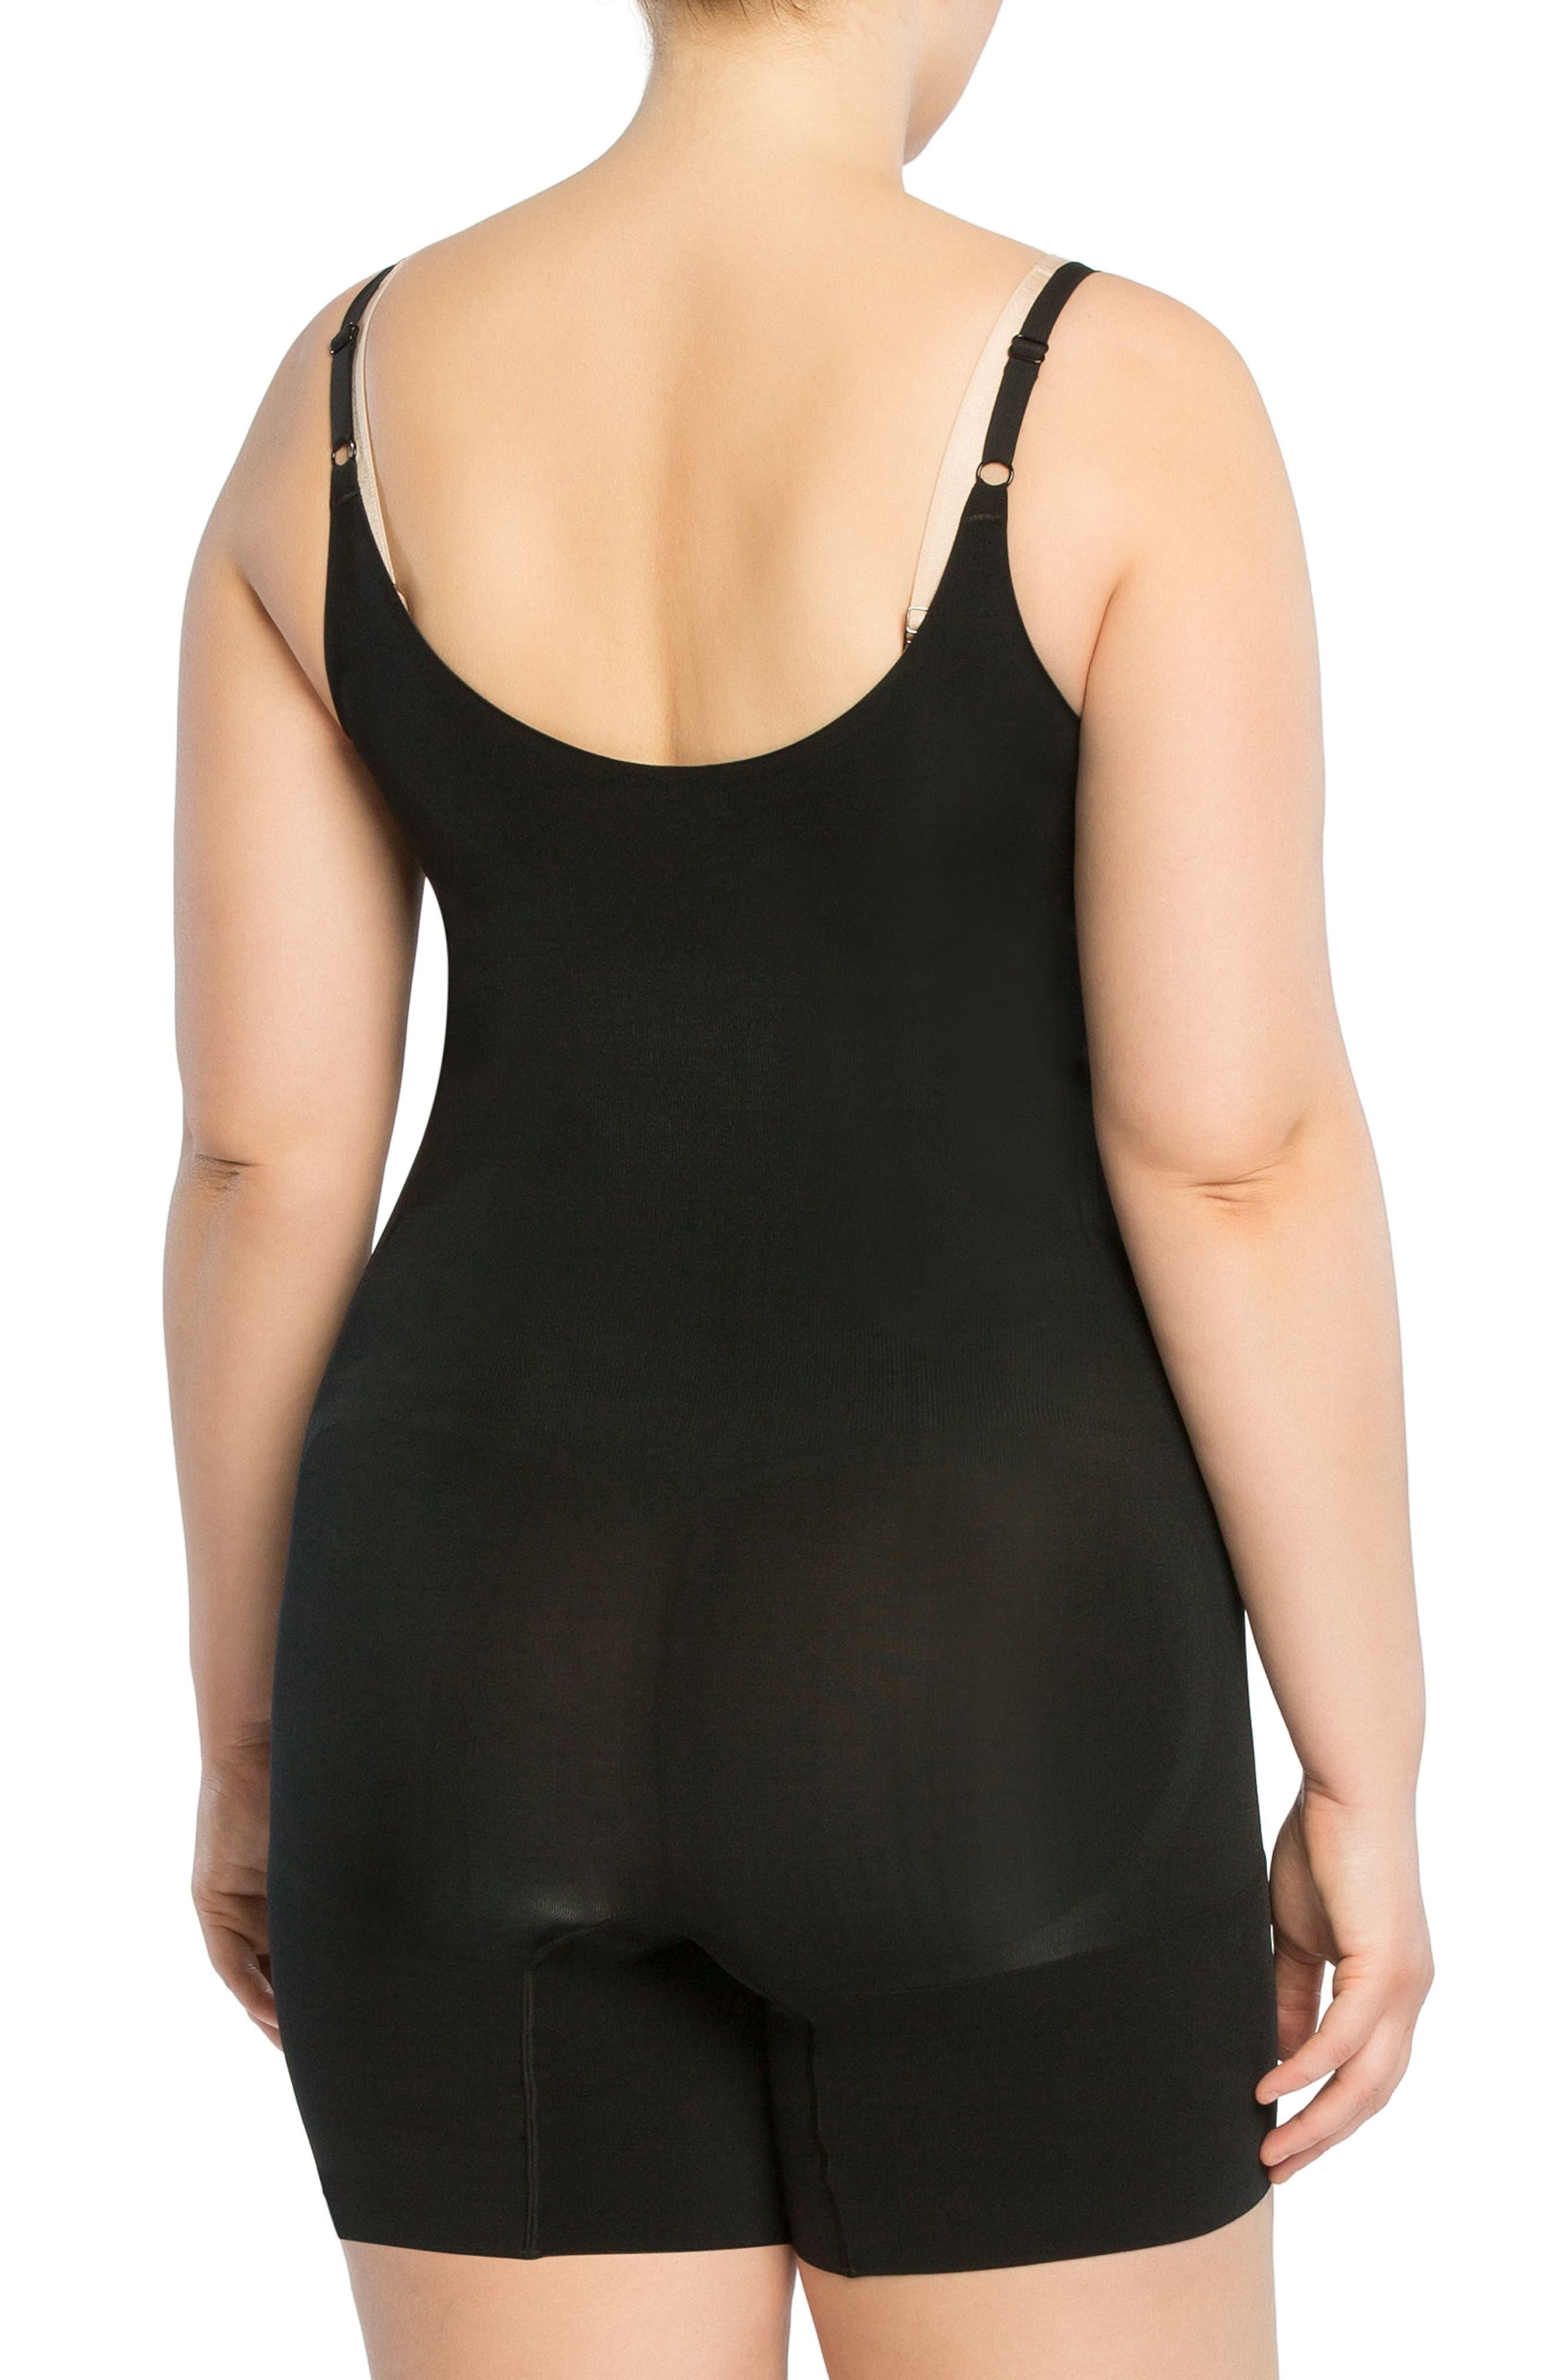 OnCore Open-Bust Mid-Thigh Shaper Bodysuit,                             Alternate thumbnail 2, color,                             Very Black